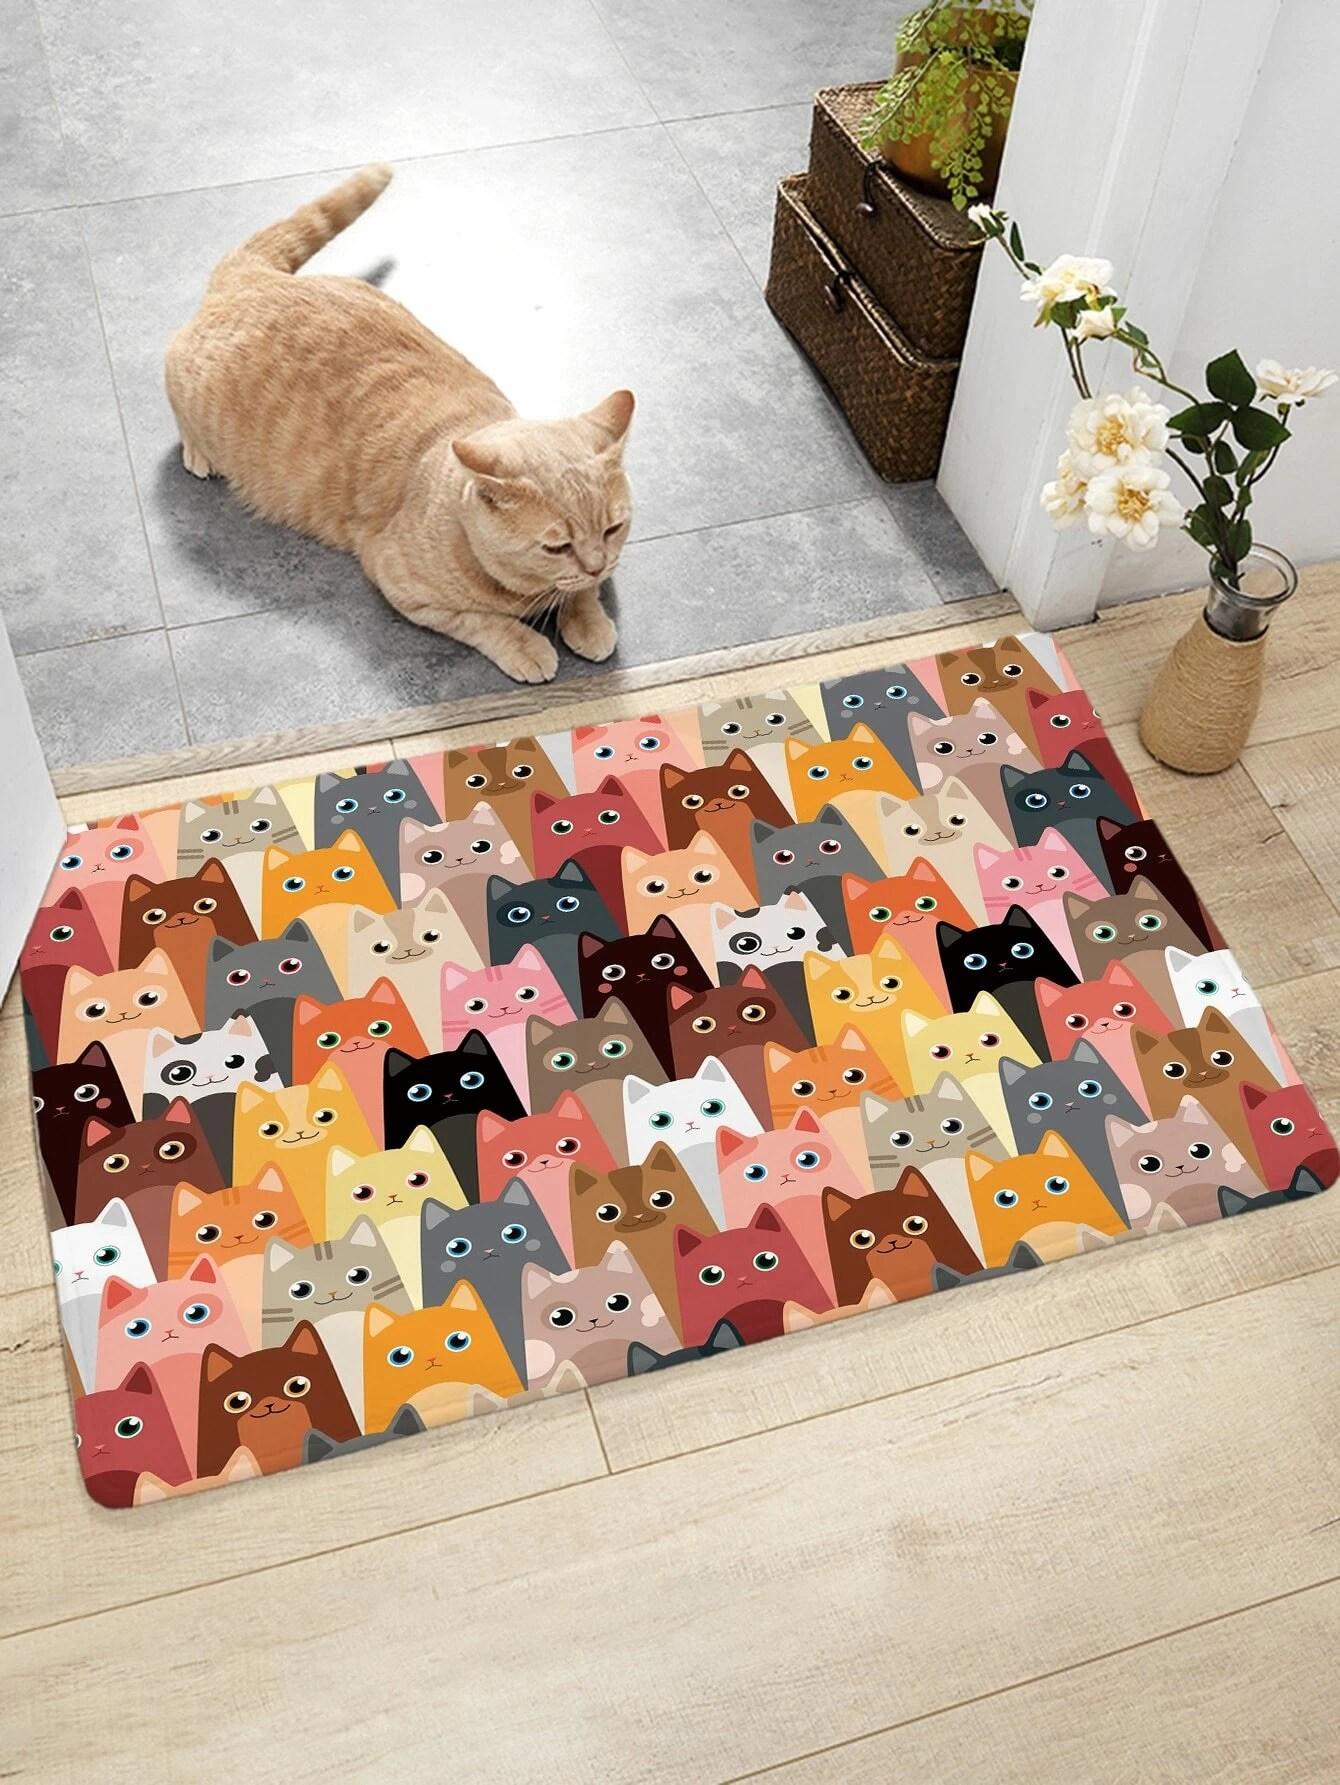 tapis de plancher a motif chat cartoon